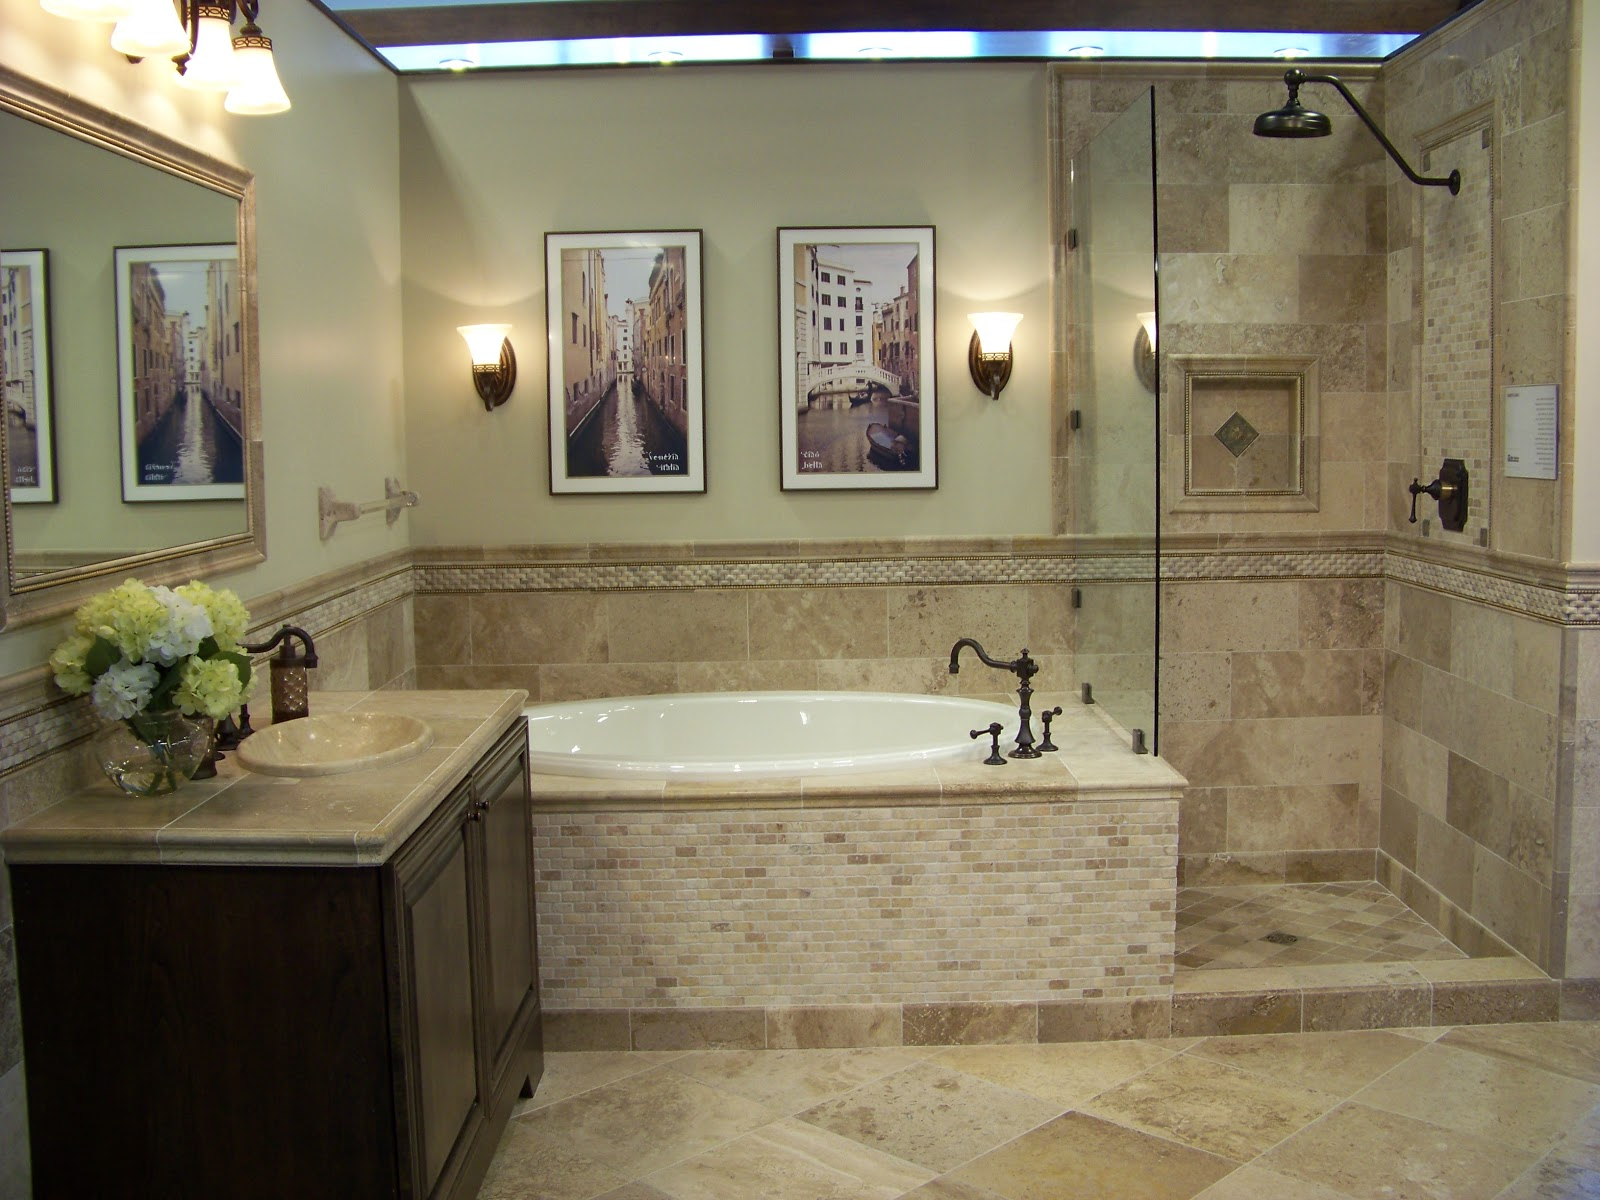 Home decor budgetista bathroom inspiration the tile shop - Bathroom wall tile design patterns ...